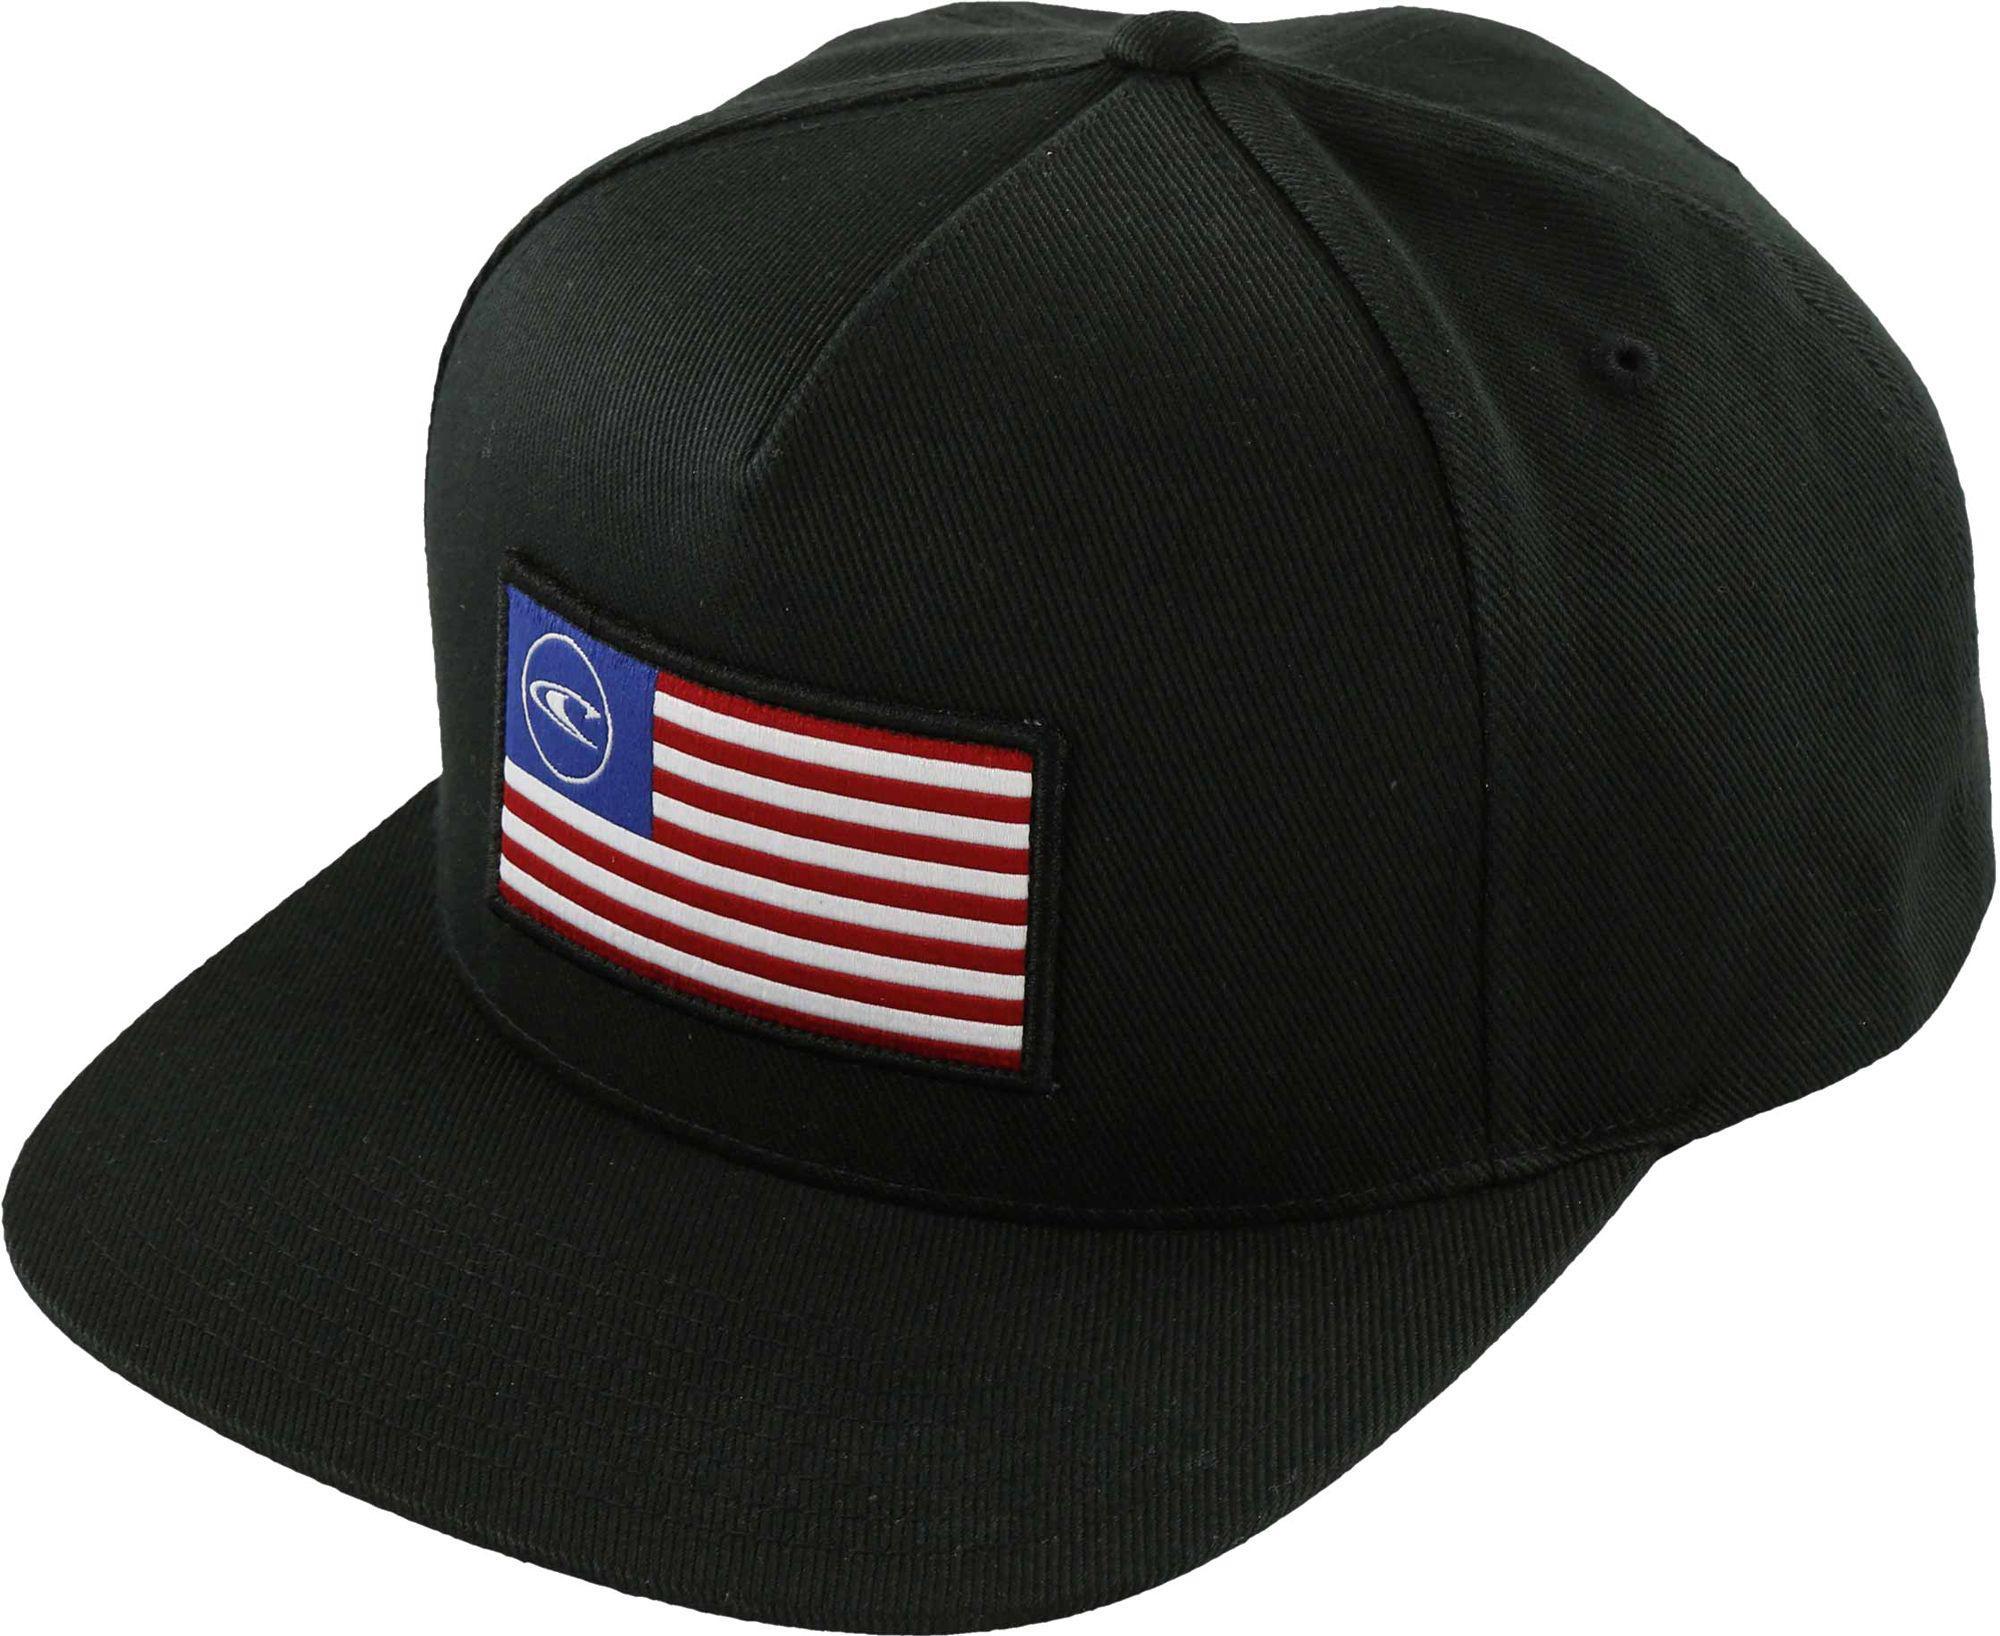 Lyst - O Neill Sportswear Signal Hat in Black for Men - Save ... 82c35305ef